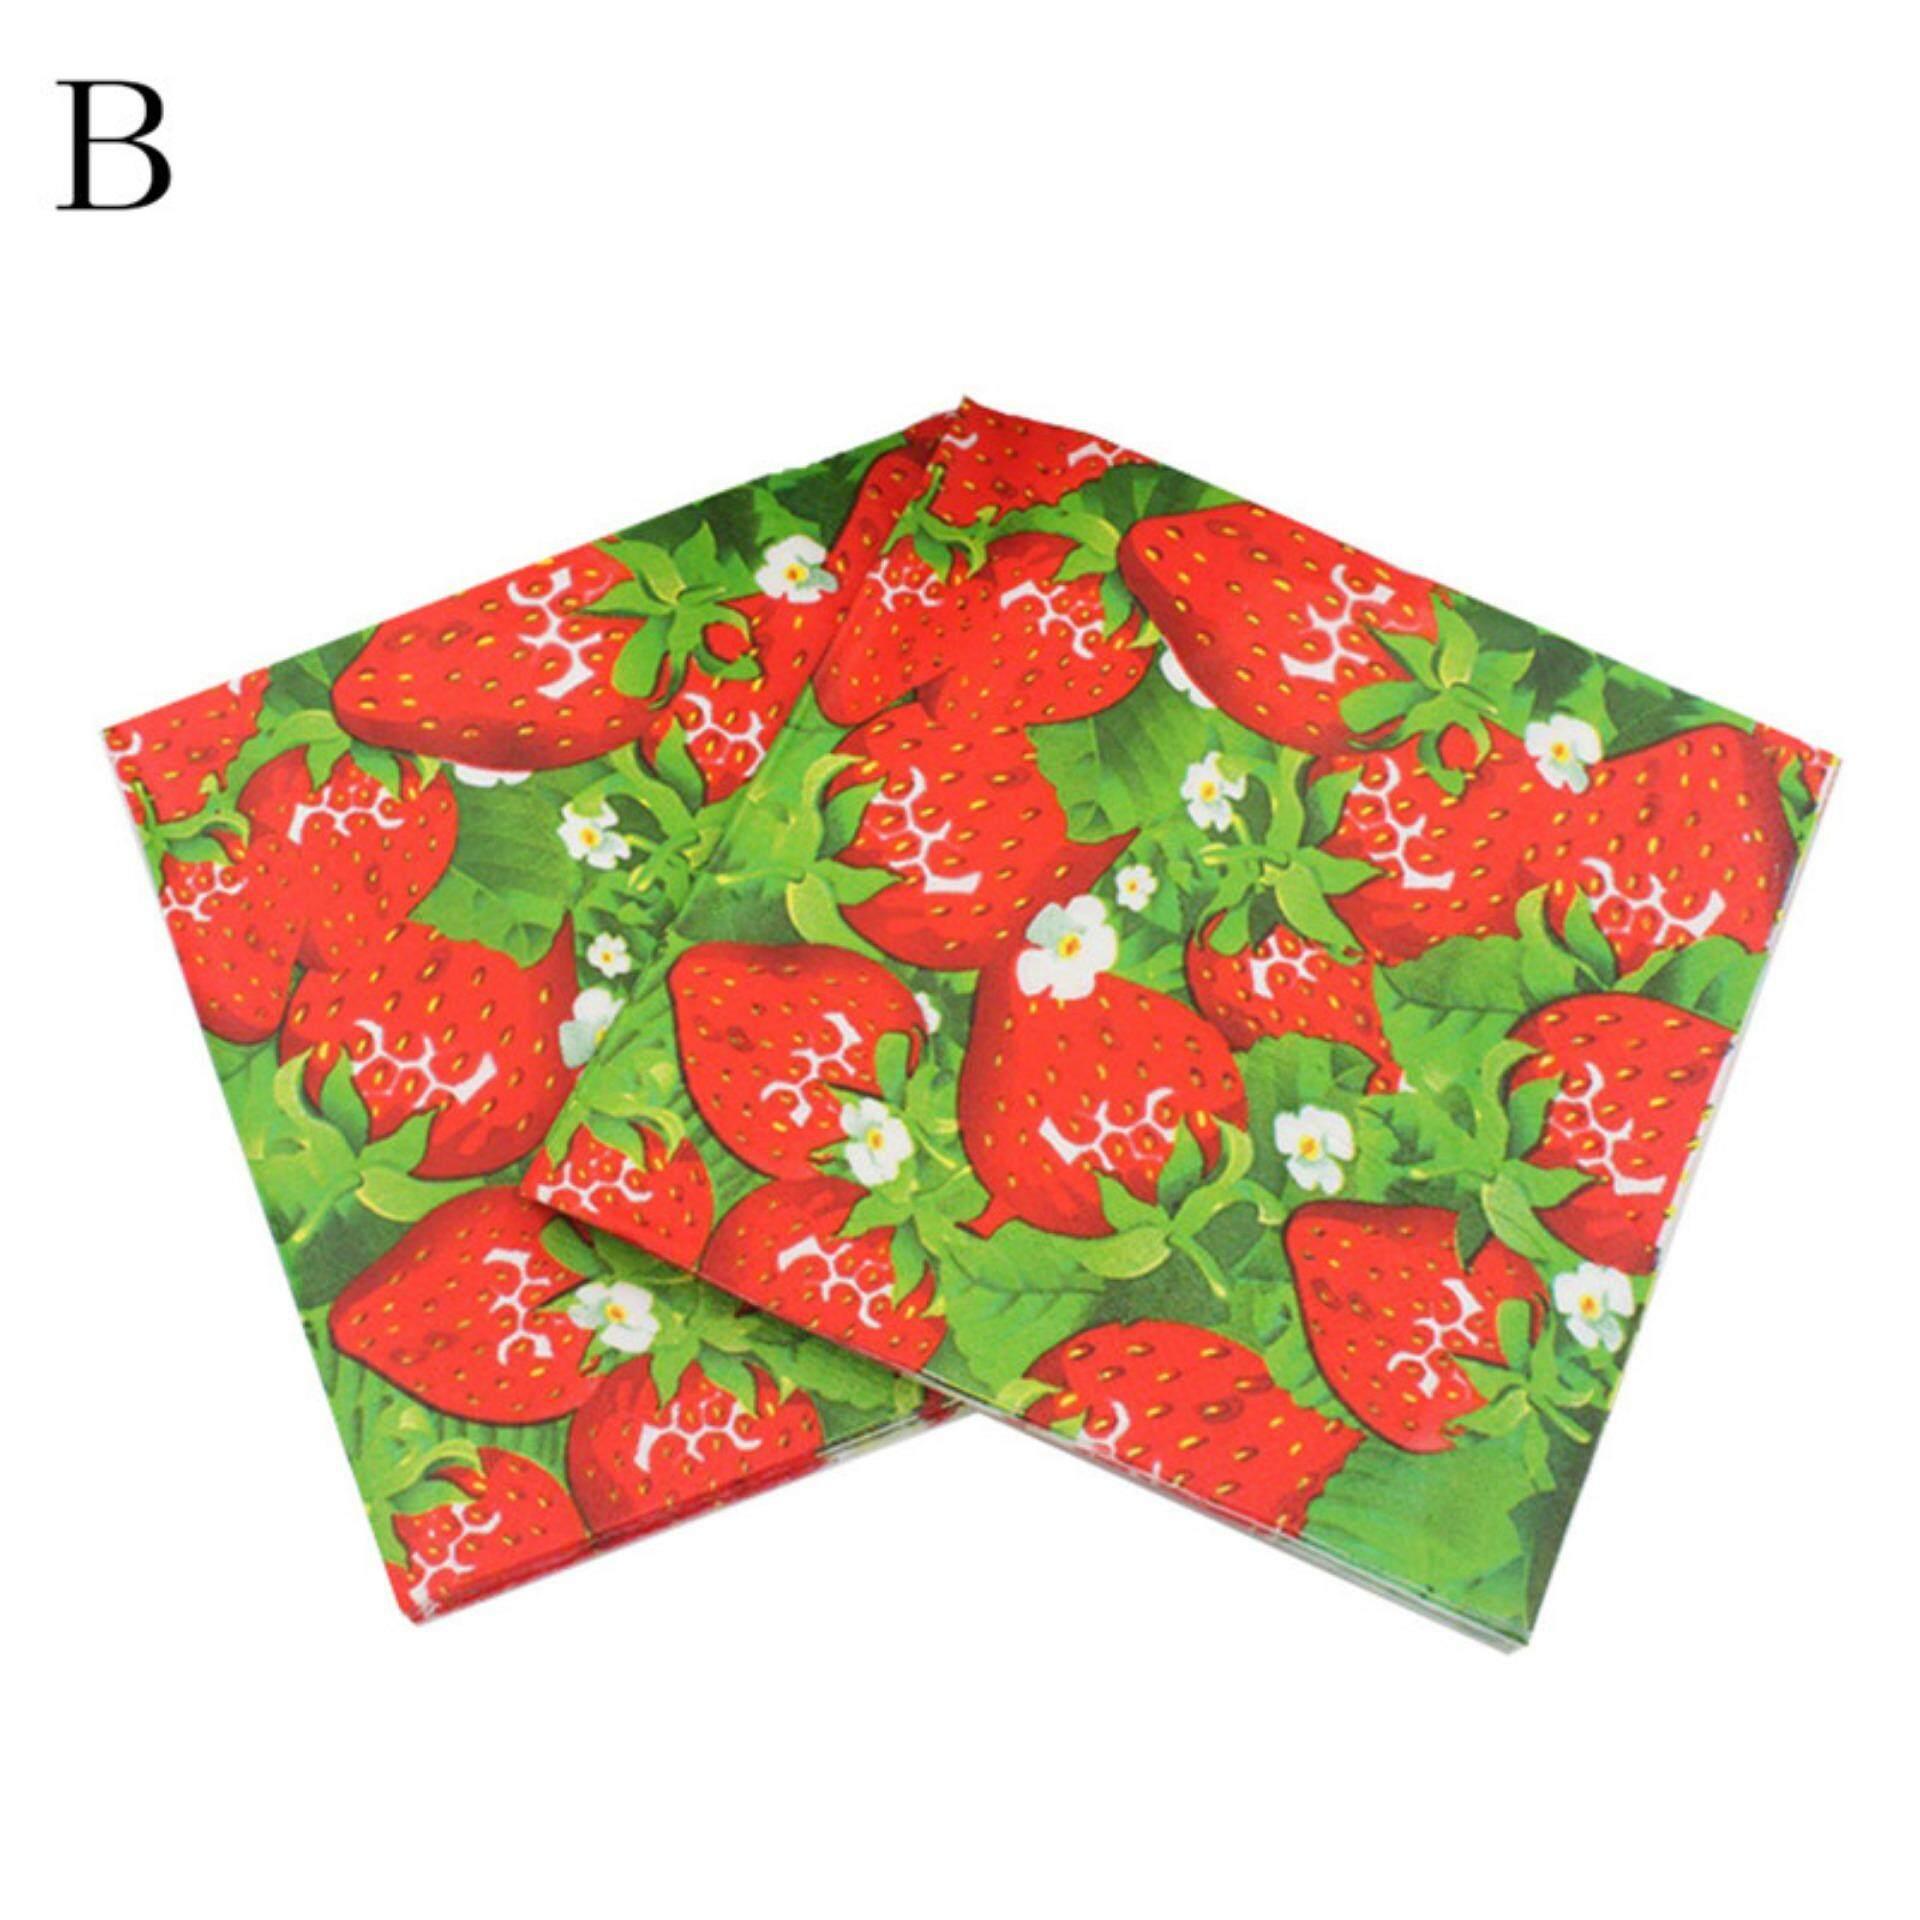 Jual Serbet Kain Lap Kotak 20pcs Fruit Pattern Watermelon Paper Napkins Kids Birthday Party Favors Disposable Napkin Styleb